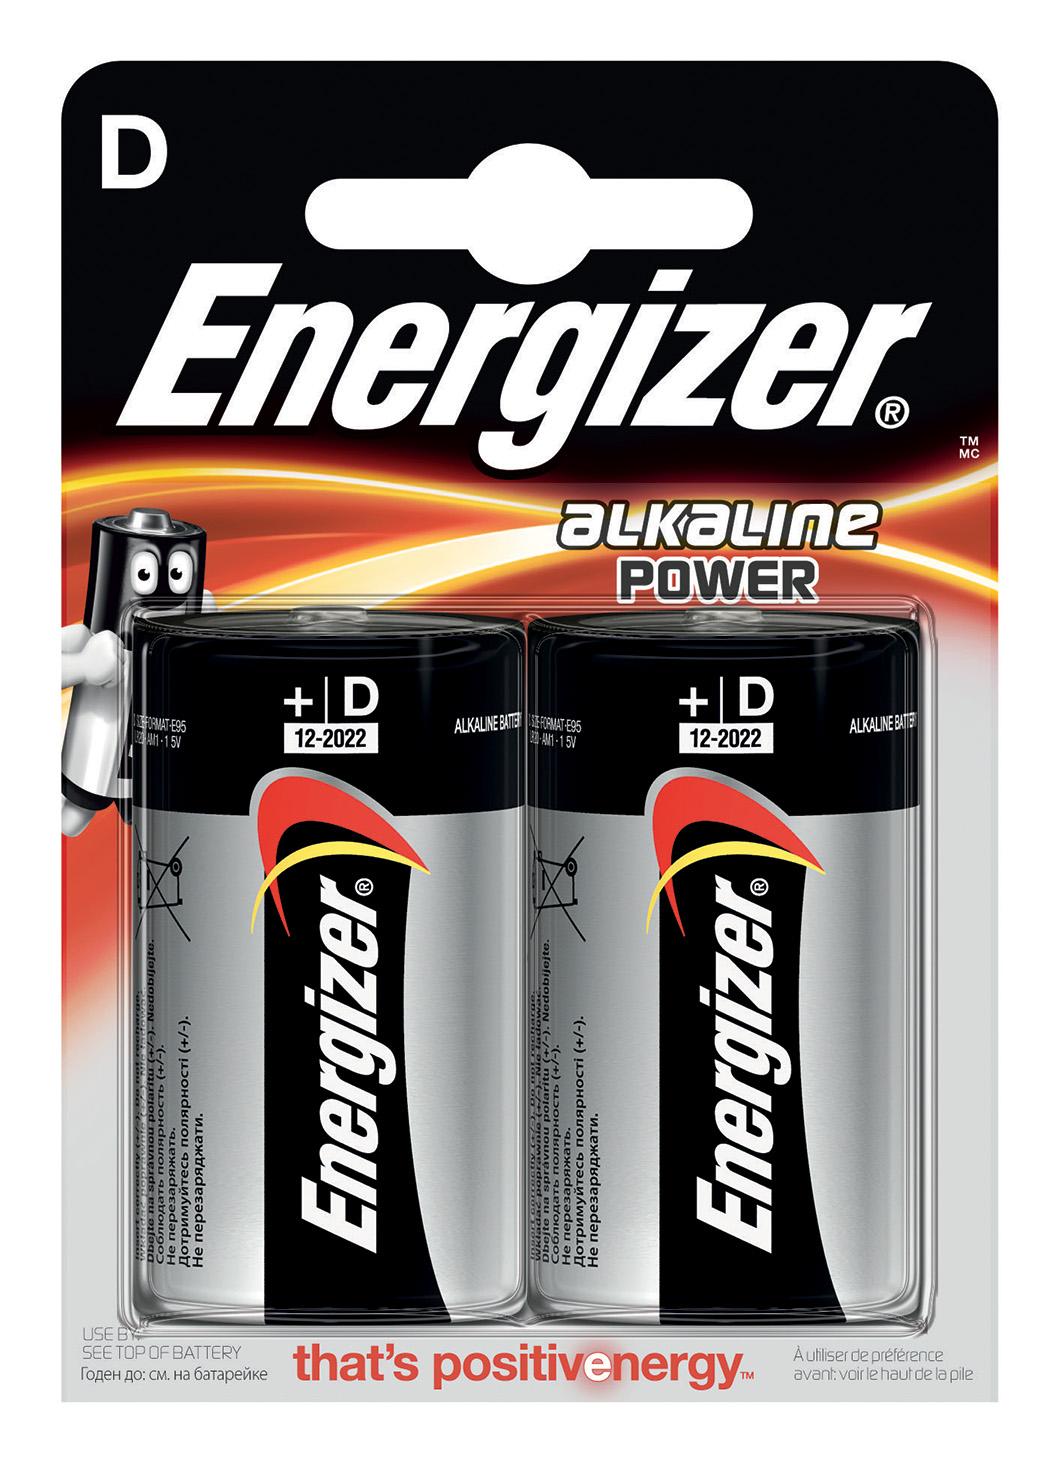 Energizer Alkaline Power D Batteria monouso Alcalino